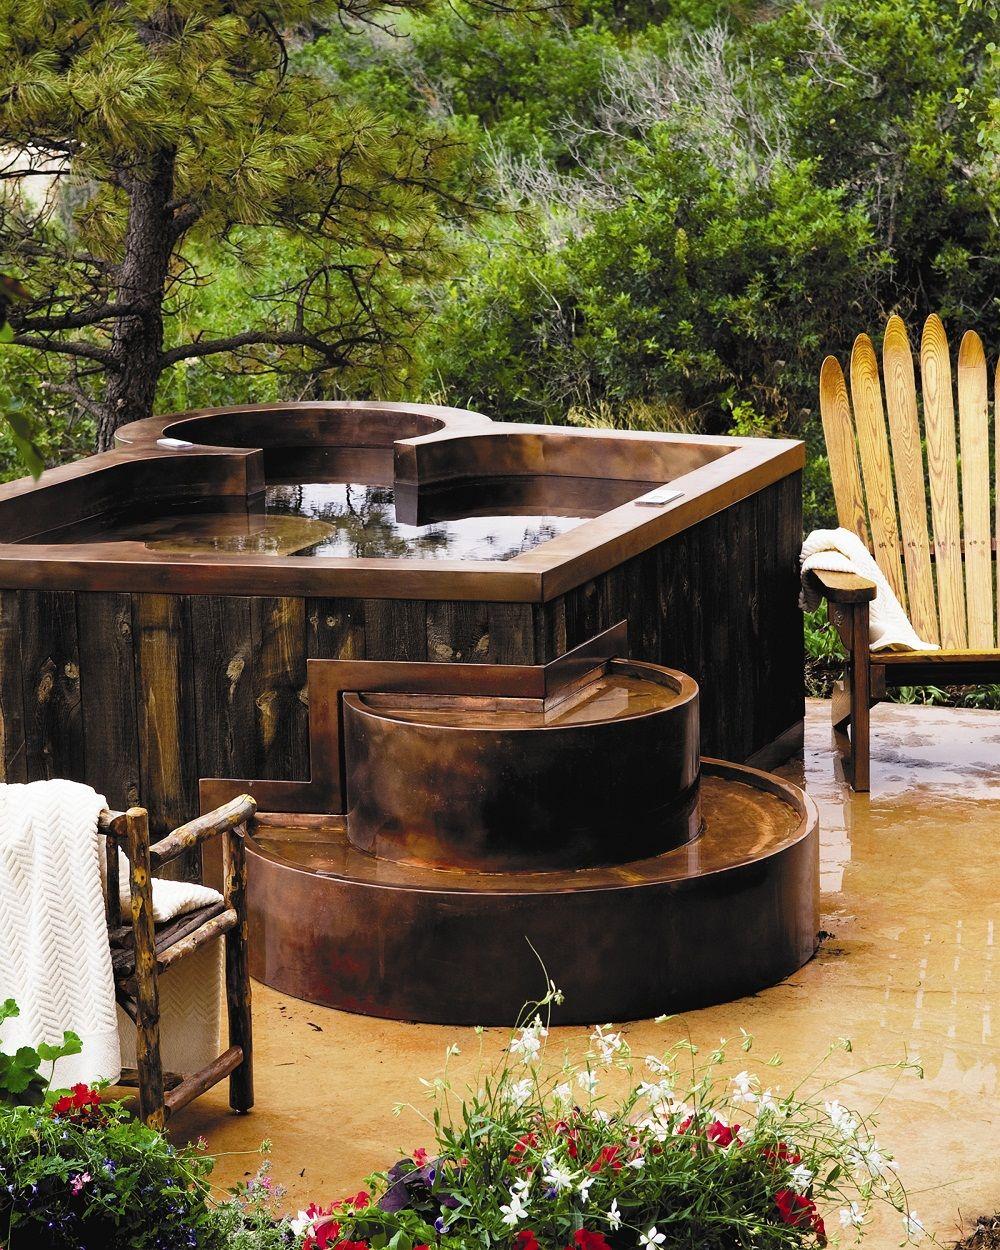 Diamond Spas Copper Hot Tub Design Cabin Hot Tub Hot Tub Cabin Homes